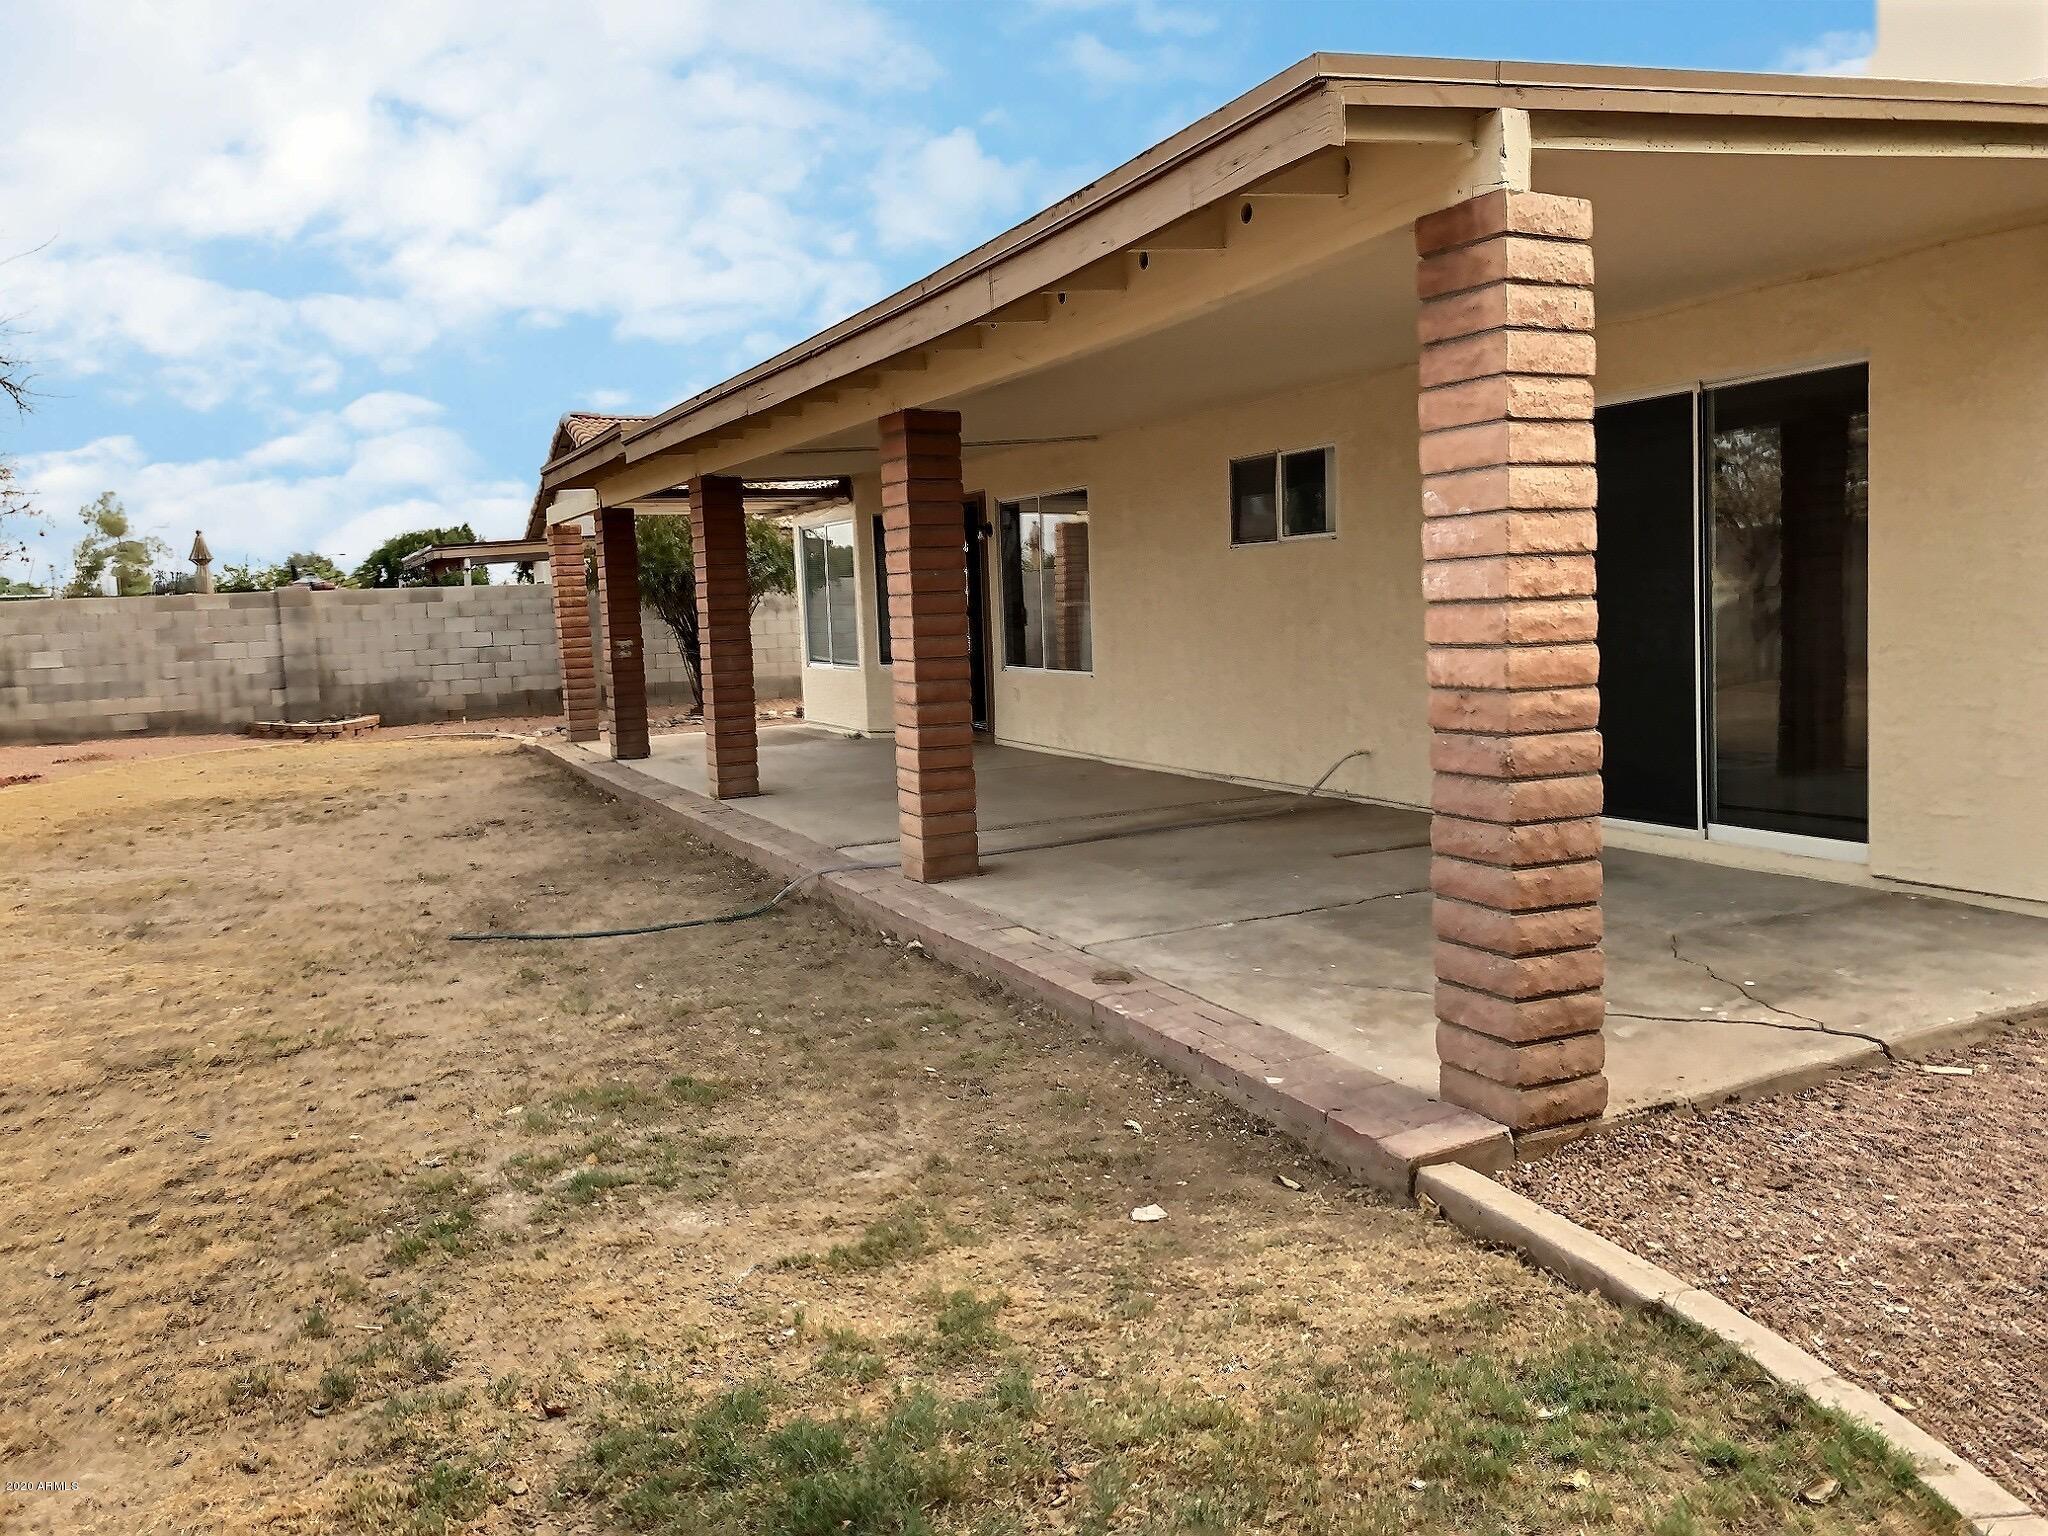 MLS 6122080 317 N JIMMY D MESSER Street, Tolleson, AZ 85353 Tolleson AZ Three Bedroom